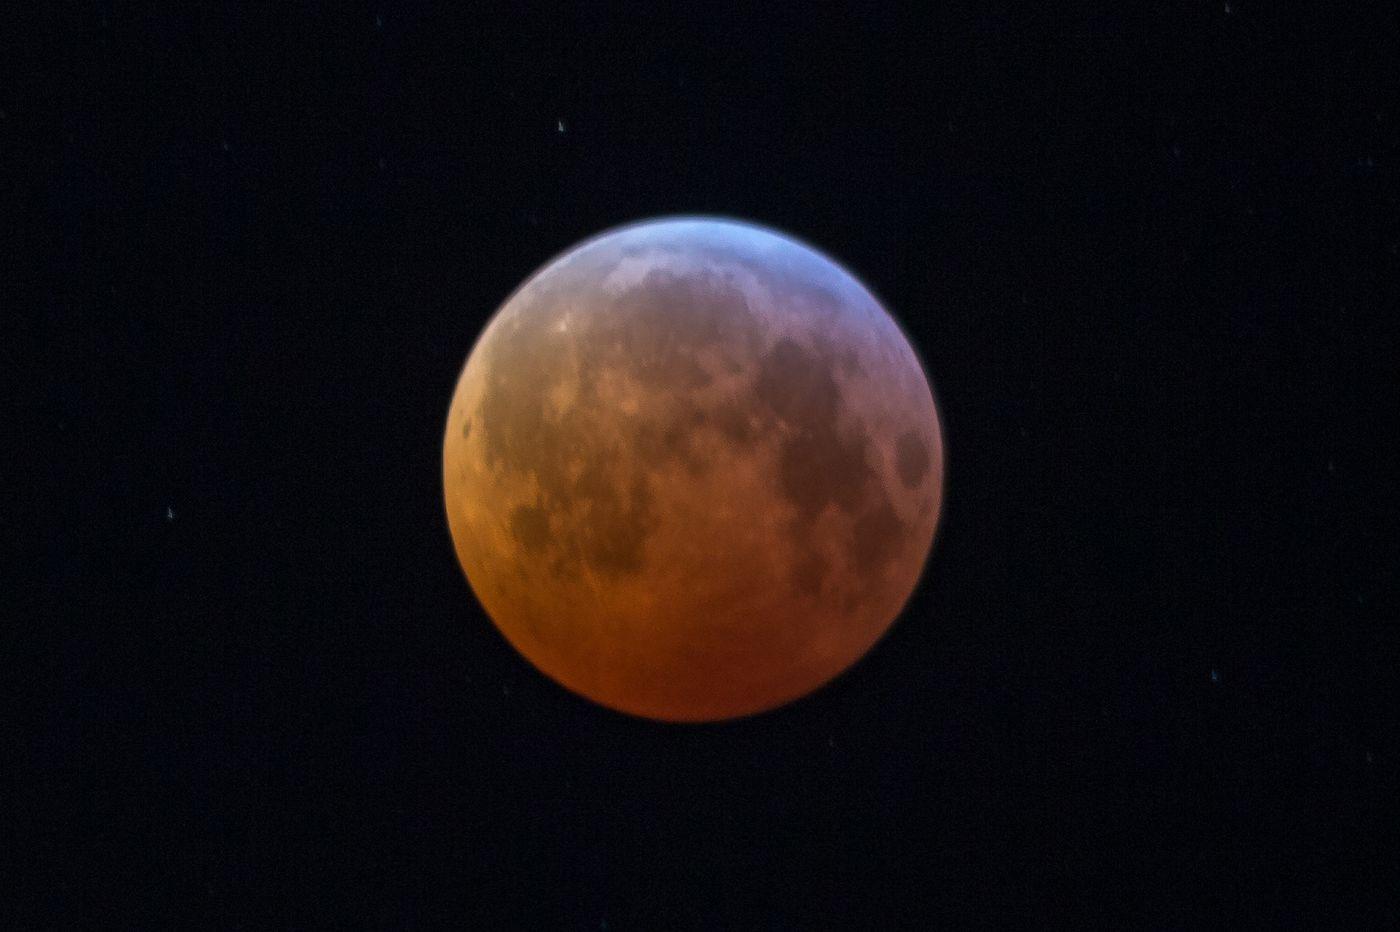 'Blood moon' lunar eclipse tonight